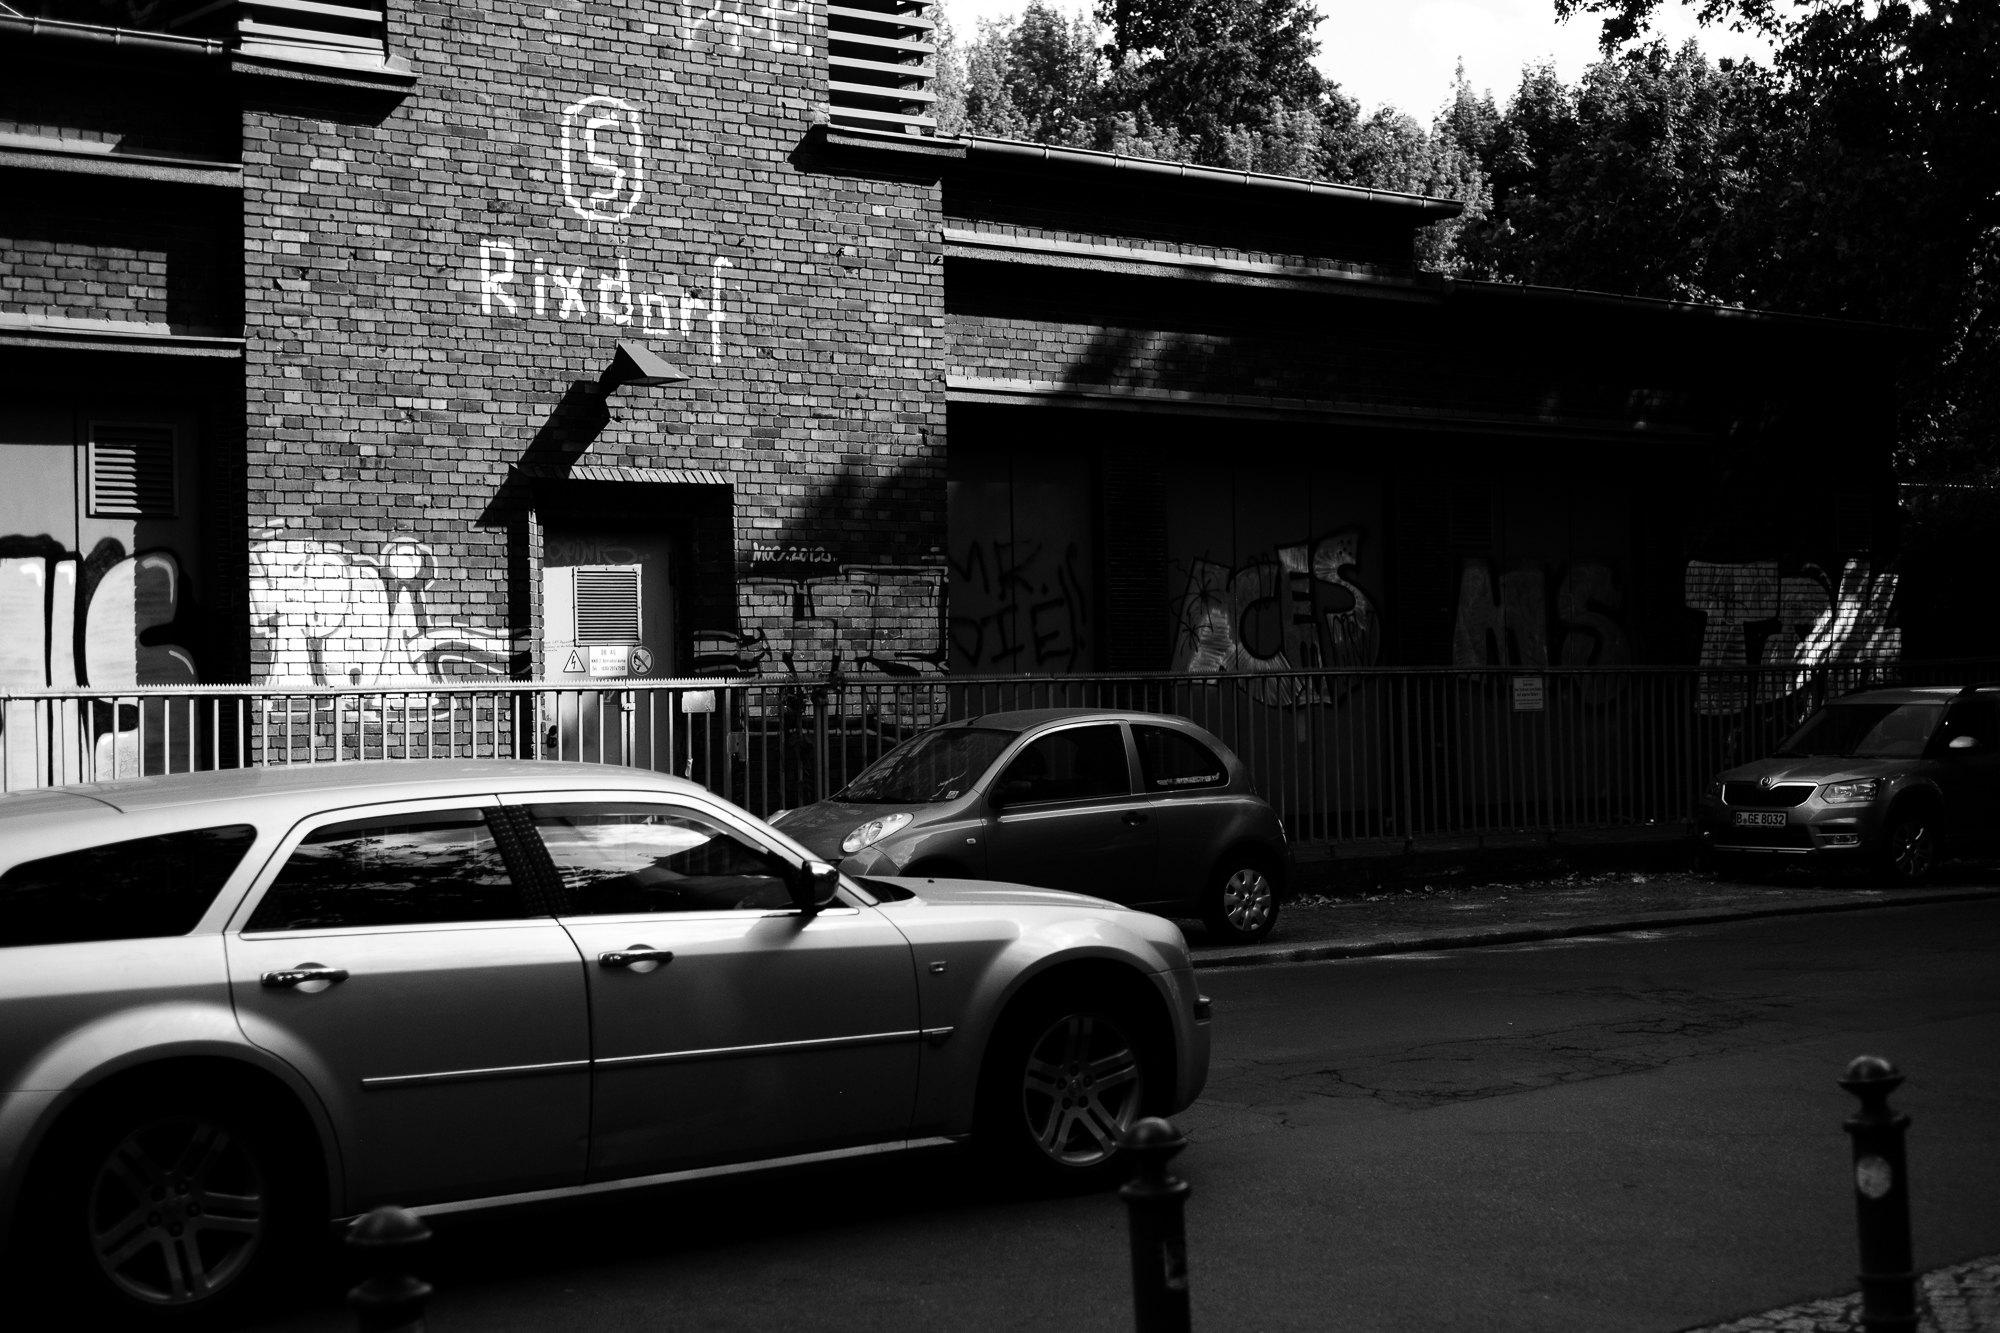 Berlin Rixdorf station